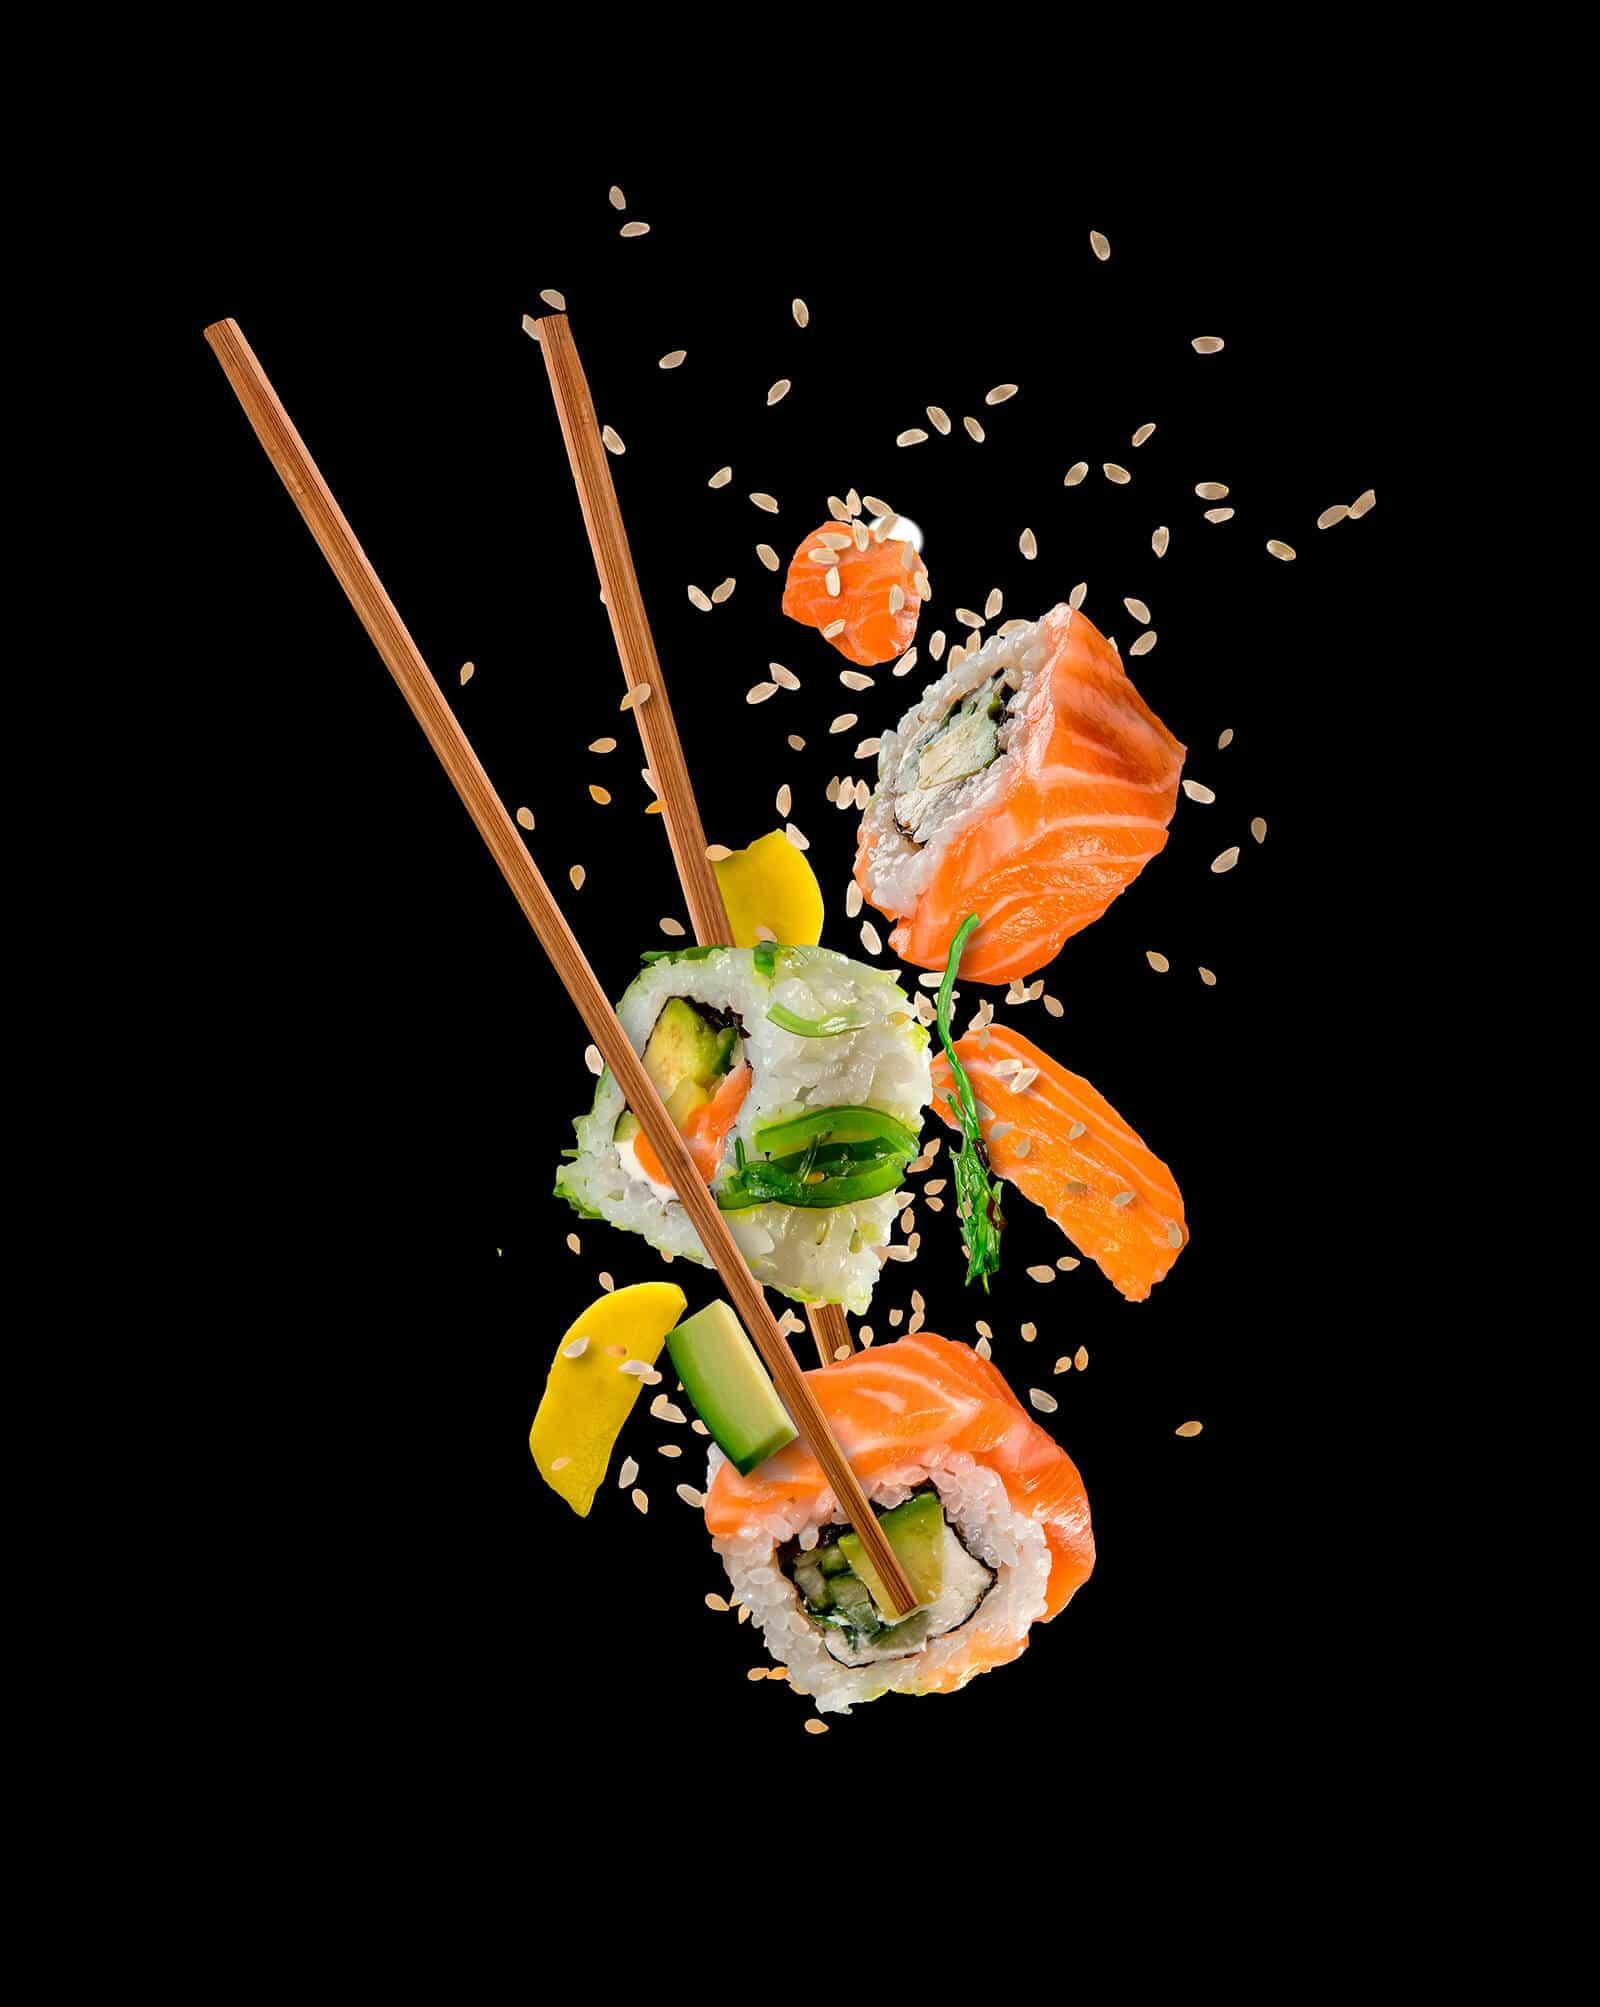 mejores restaurantes para comer suhsi sevilla